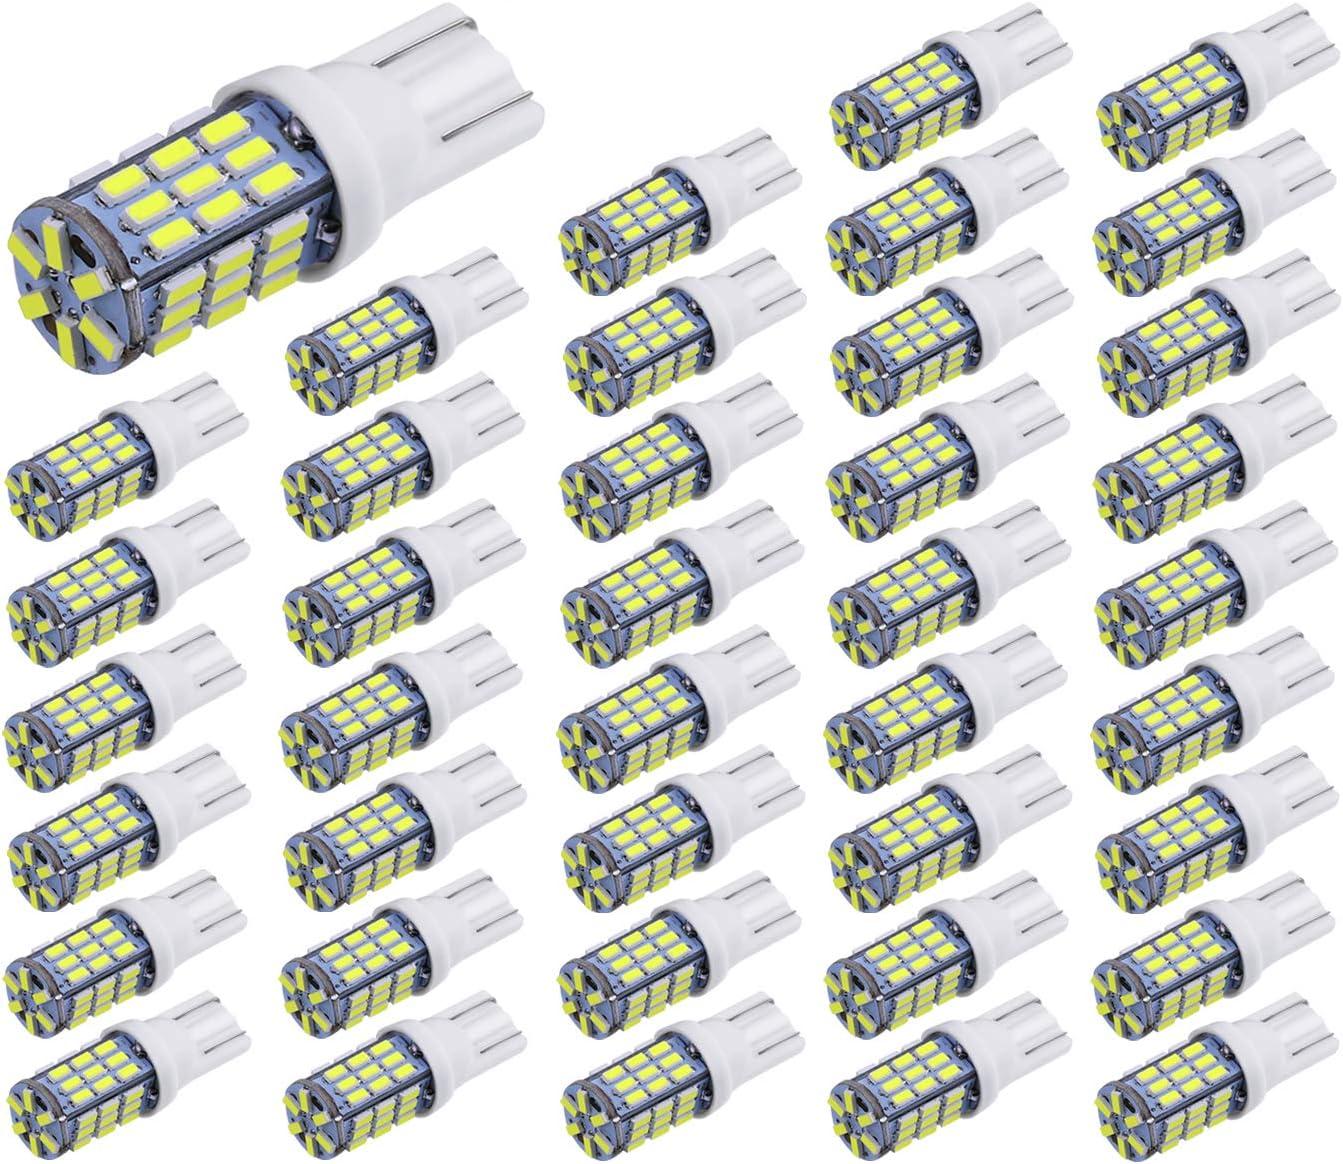 Aucan 40pcs Super Bright RV Trailer T10 921 194 42-SMD 12V Car Backup Reverse LED Lights Bulbs Light Width Lamp Xenon White